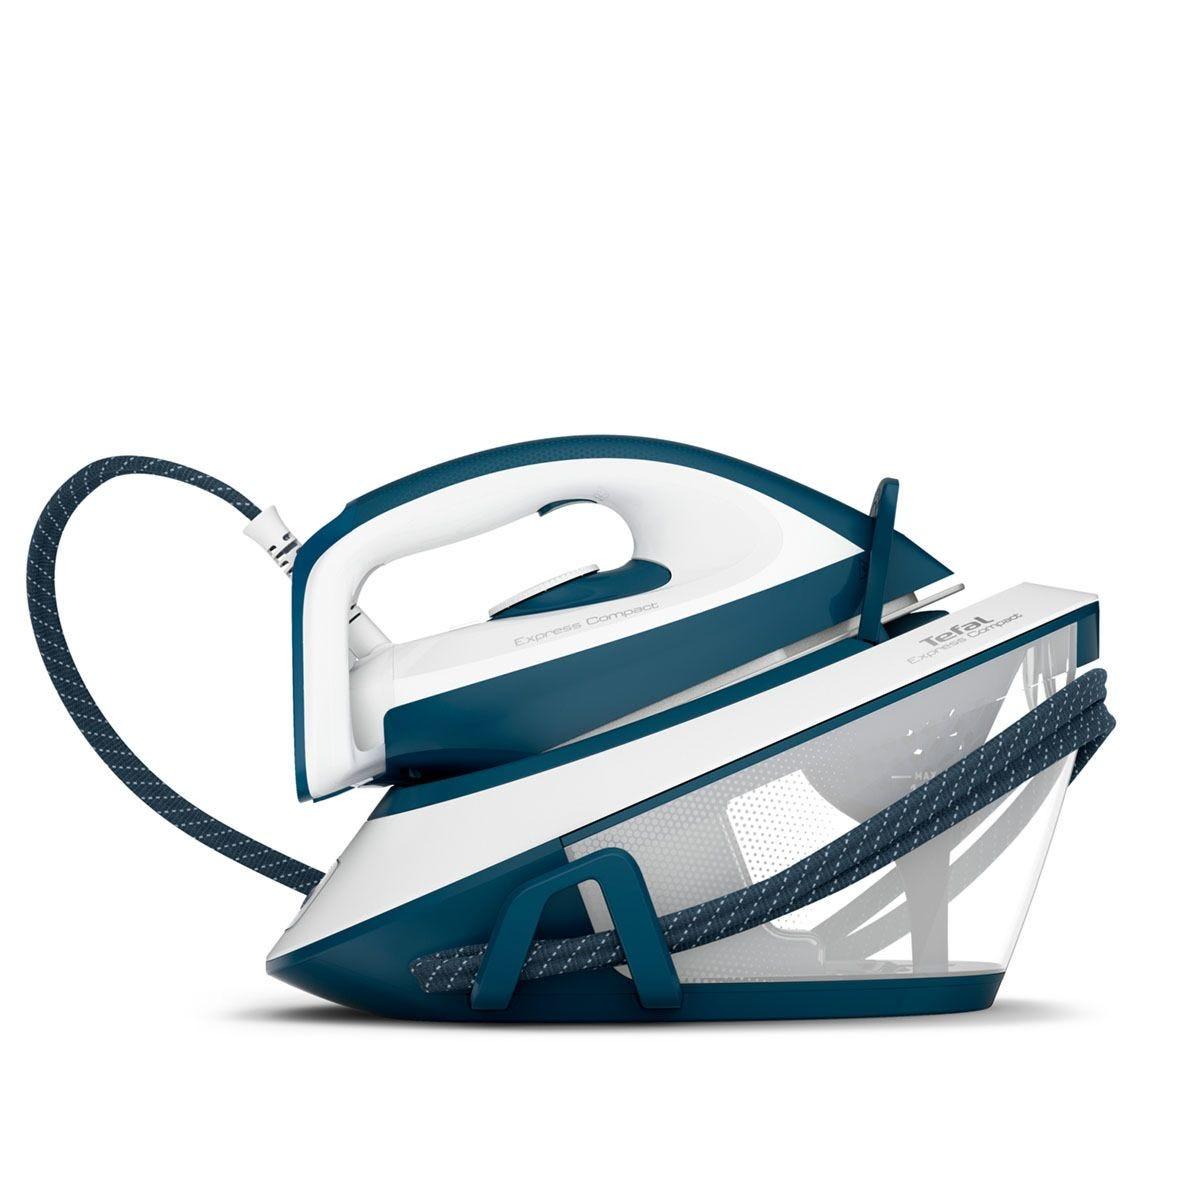 Tefal SV7110 Express Compact Steam Generator Iron – Blue